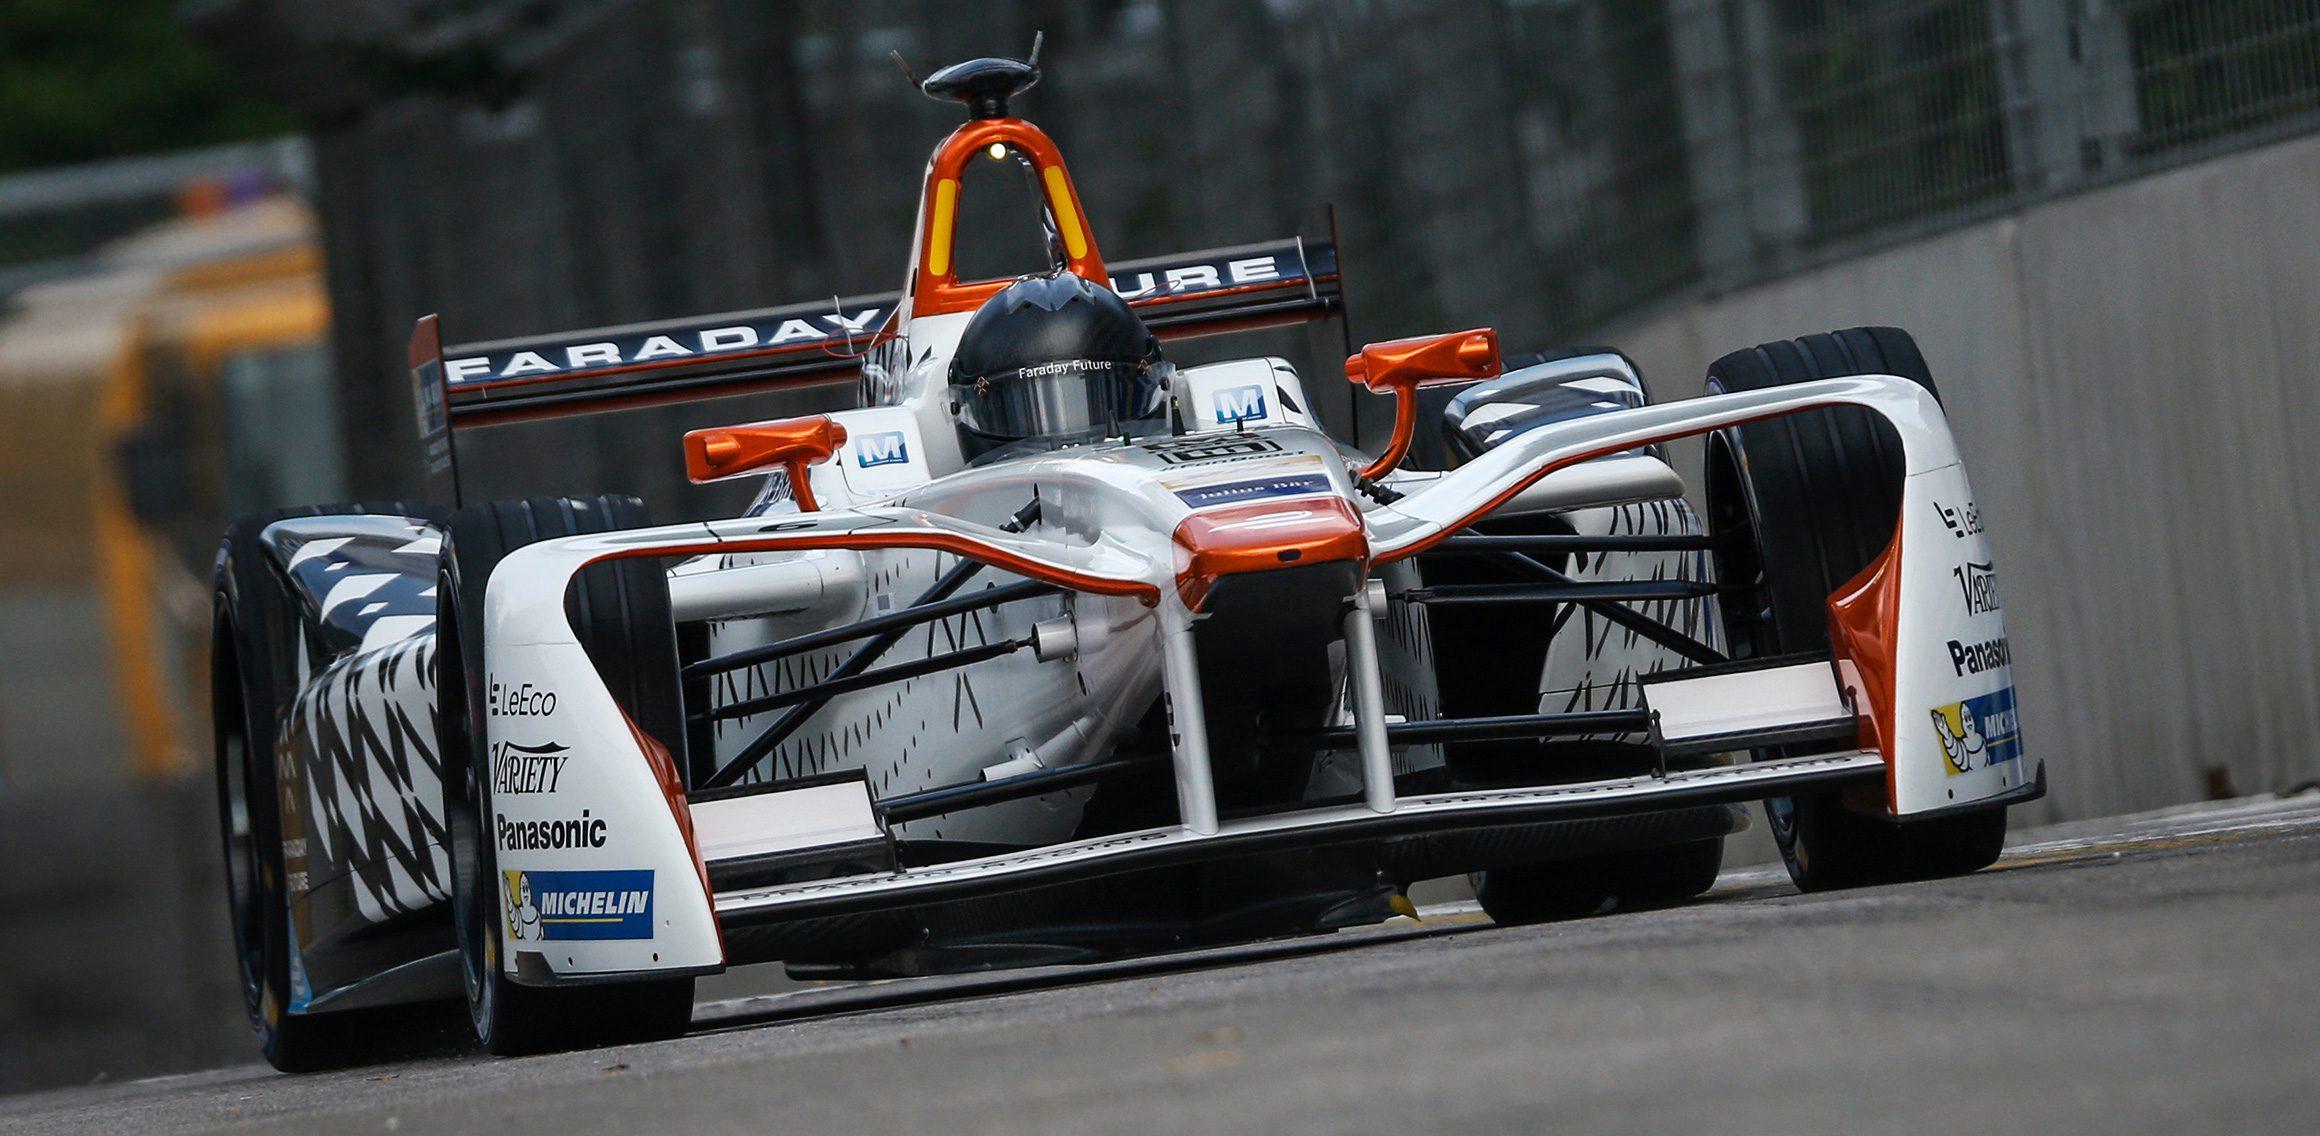 faraday-future-dragon-racing-formula-e-race-car-specs-hero-photo